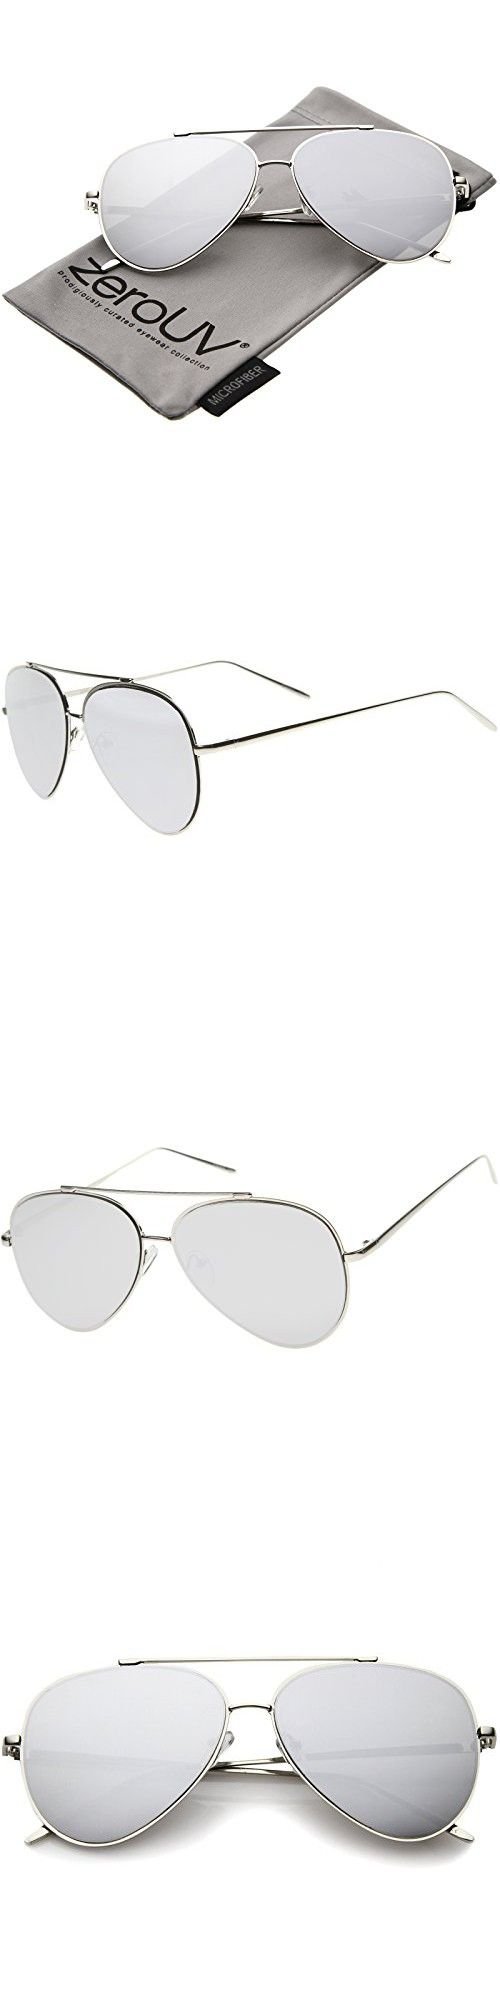 846087ea5f ZeroUV - Mod Fashion Teardrop Rimless Mirror Flat Lens Metal Frame Aviator  Sunglasses 58mm (Silver   Silver Mirror) in 2018